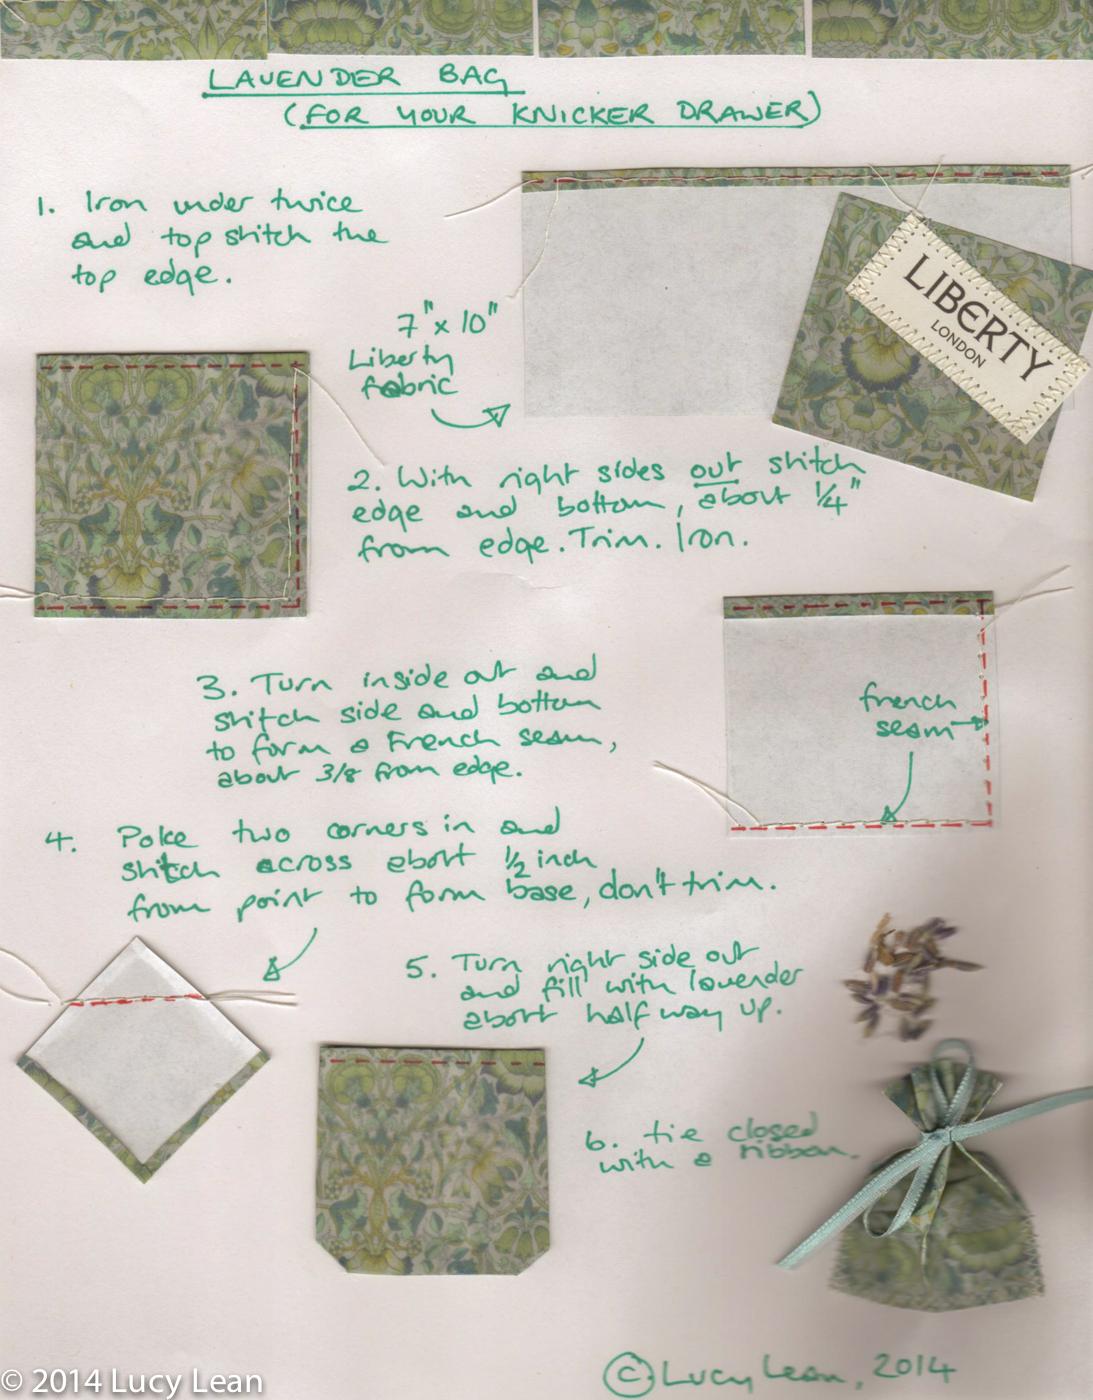 How to make Lavender Bag Instructions